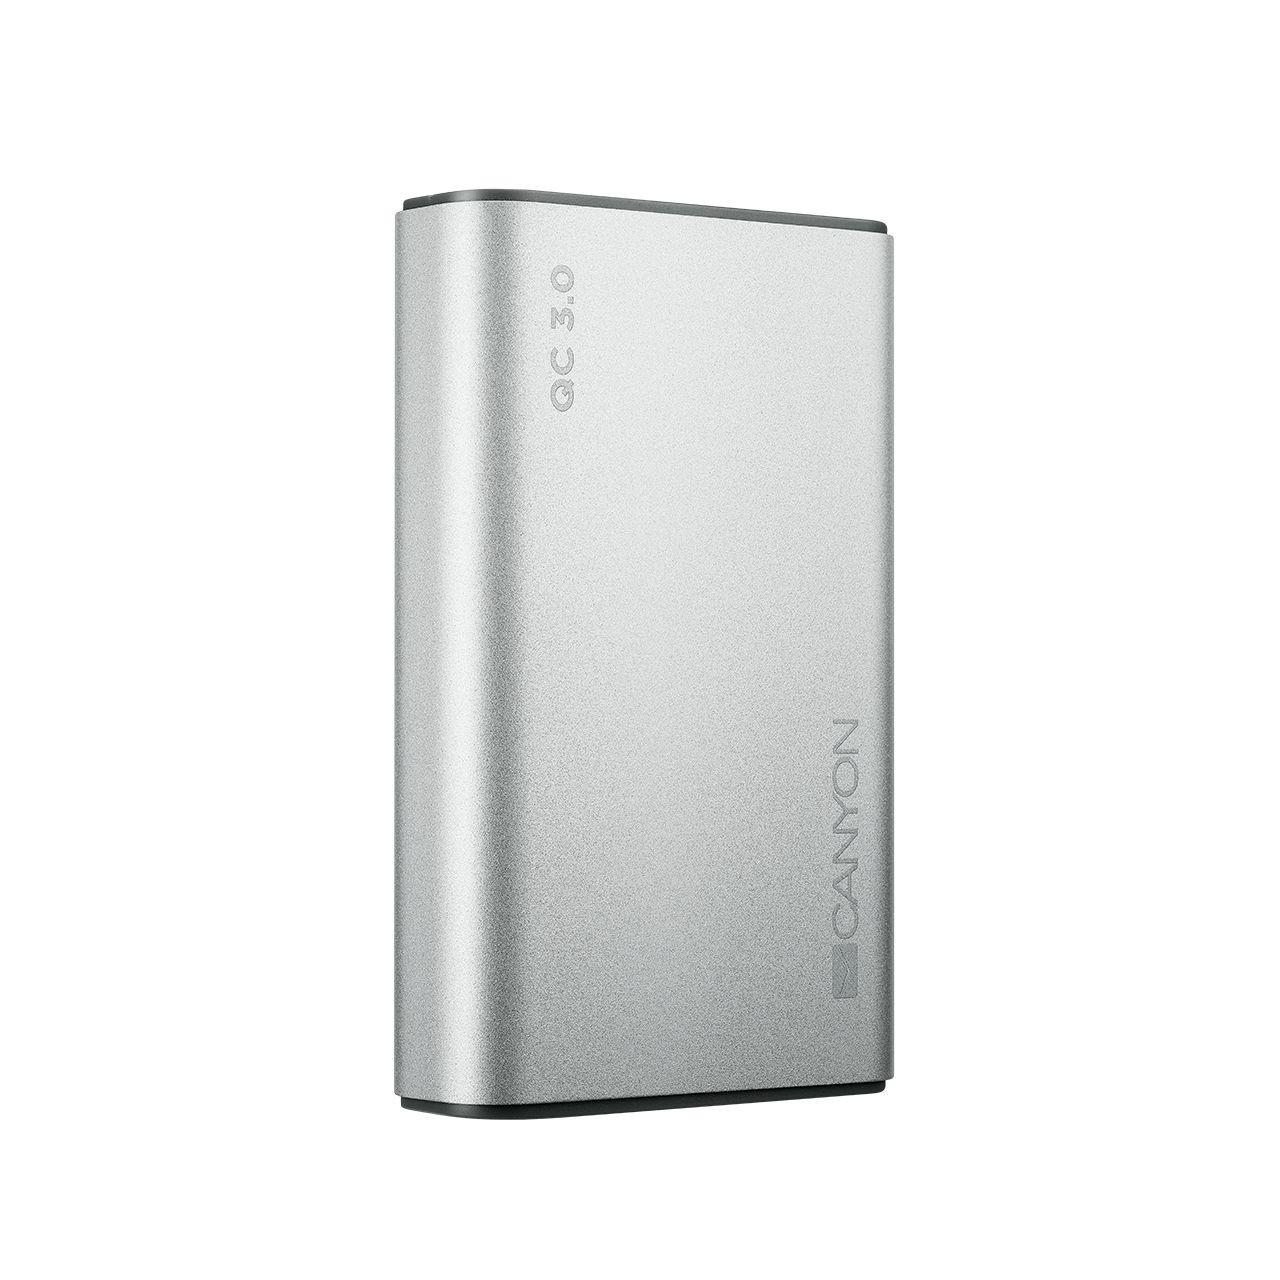 Универсальная мобильная батарея Canyon 10000mAh QC3.0 Silver (CND-TPBQC10S)